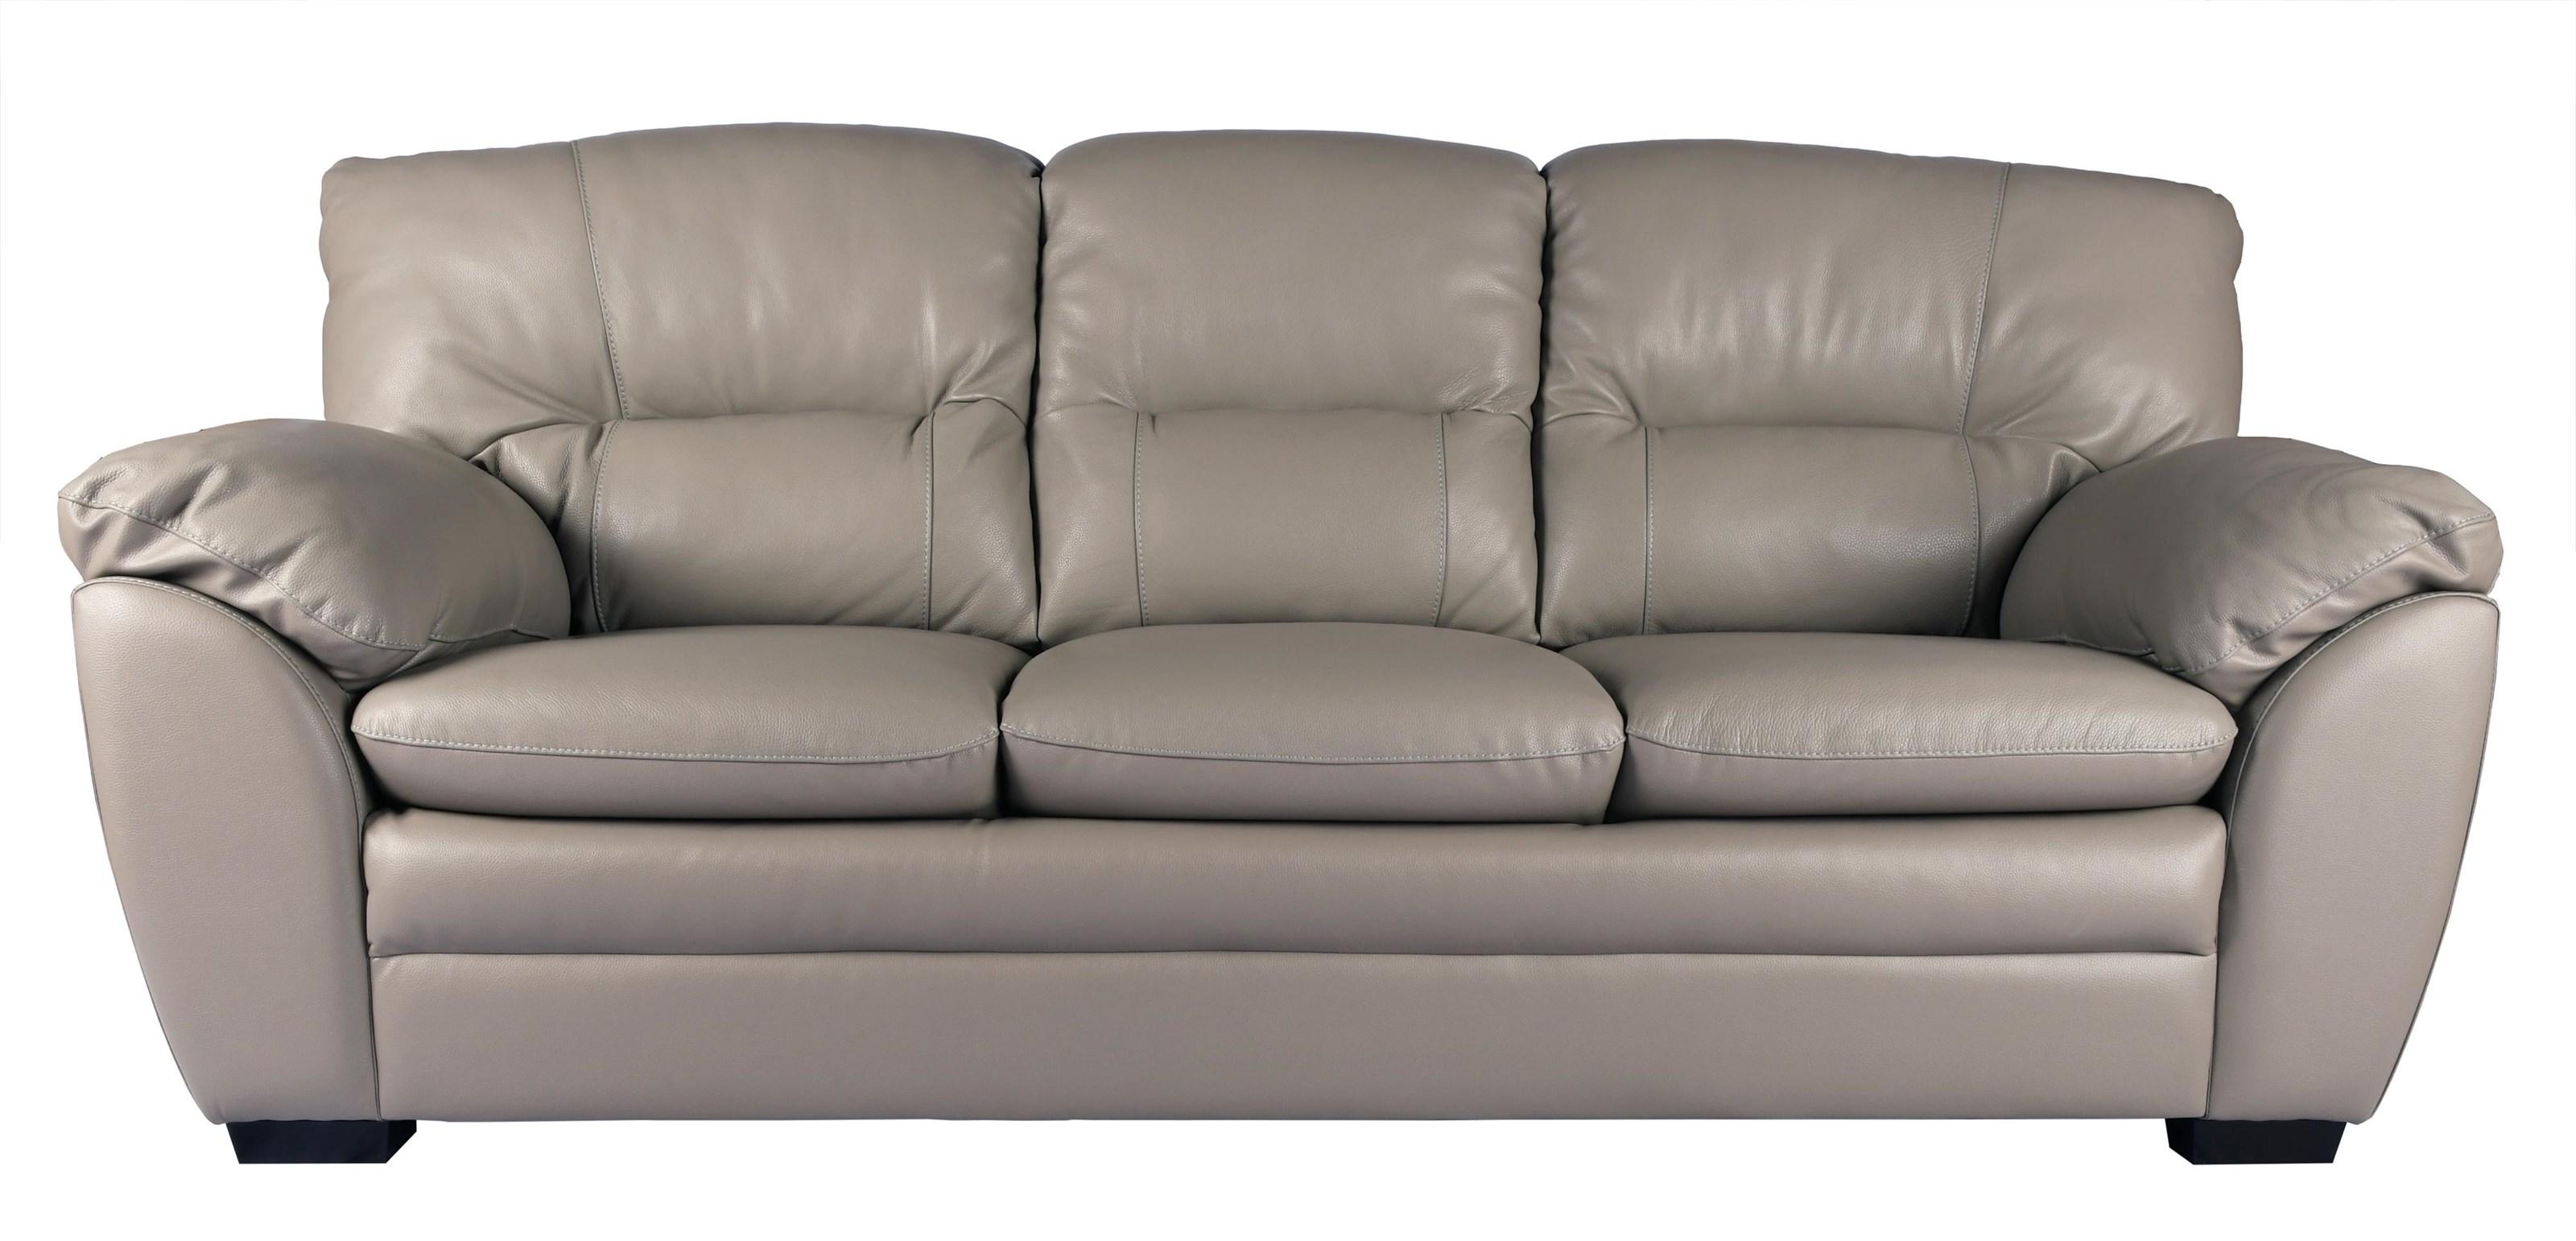 Buckhorn Sofa by Rockwood at Bennett's Furniture and Mattresses